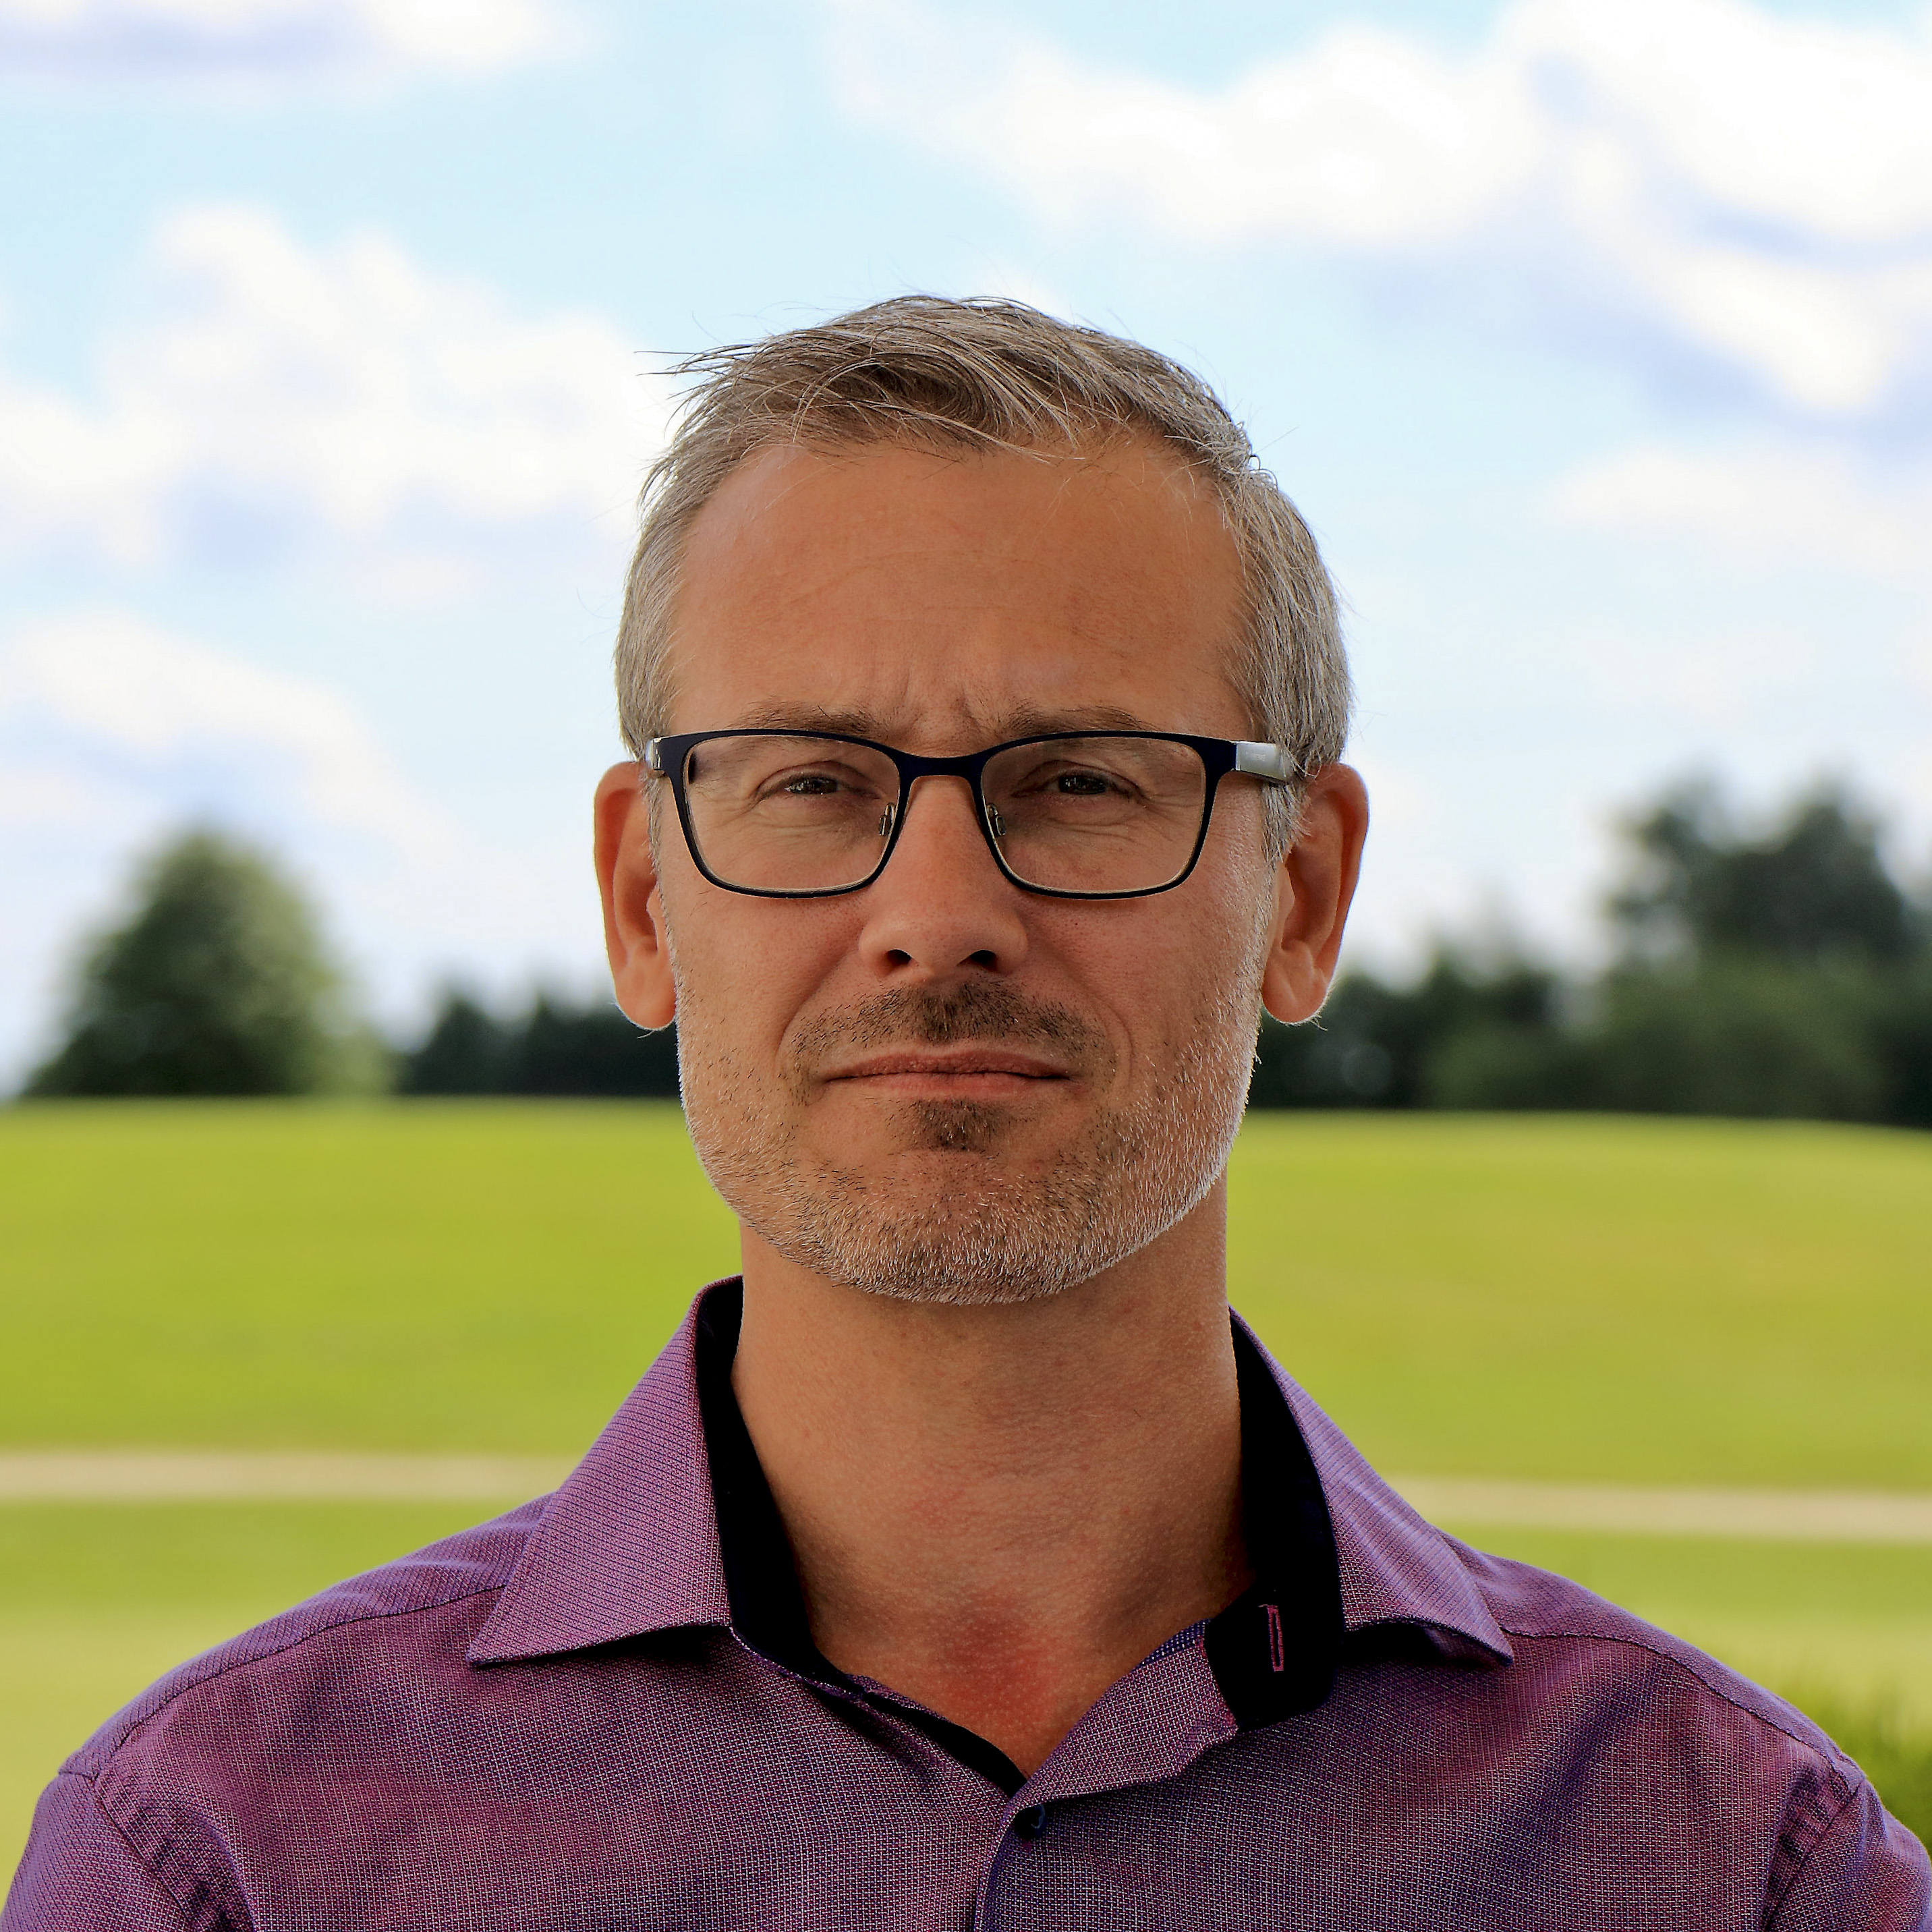 Michael Tabor Rasmussen